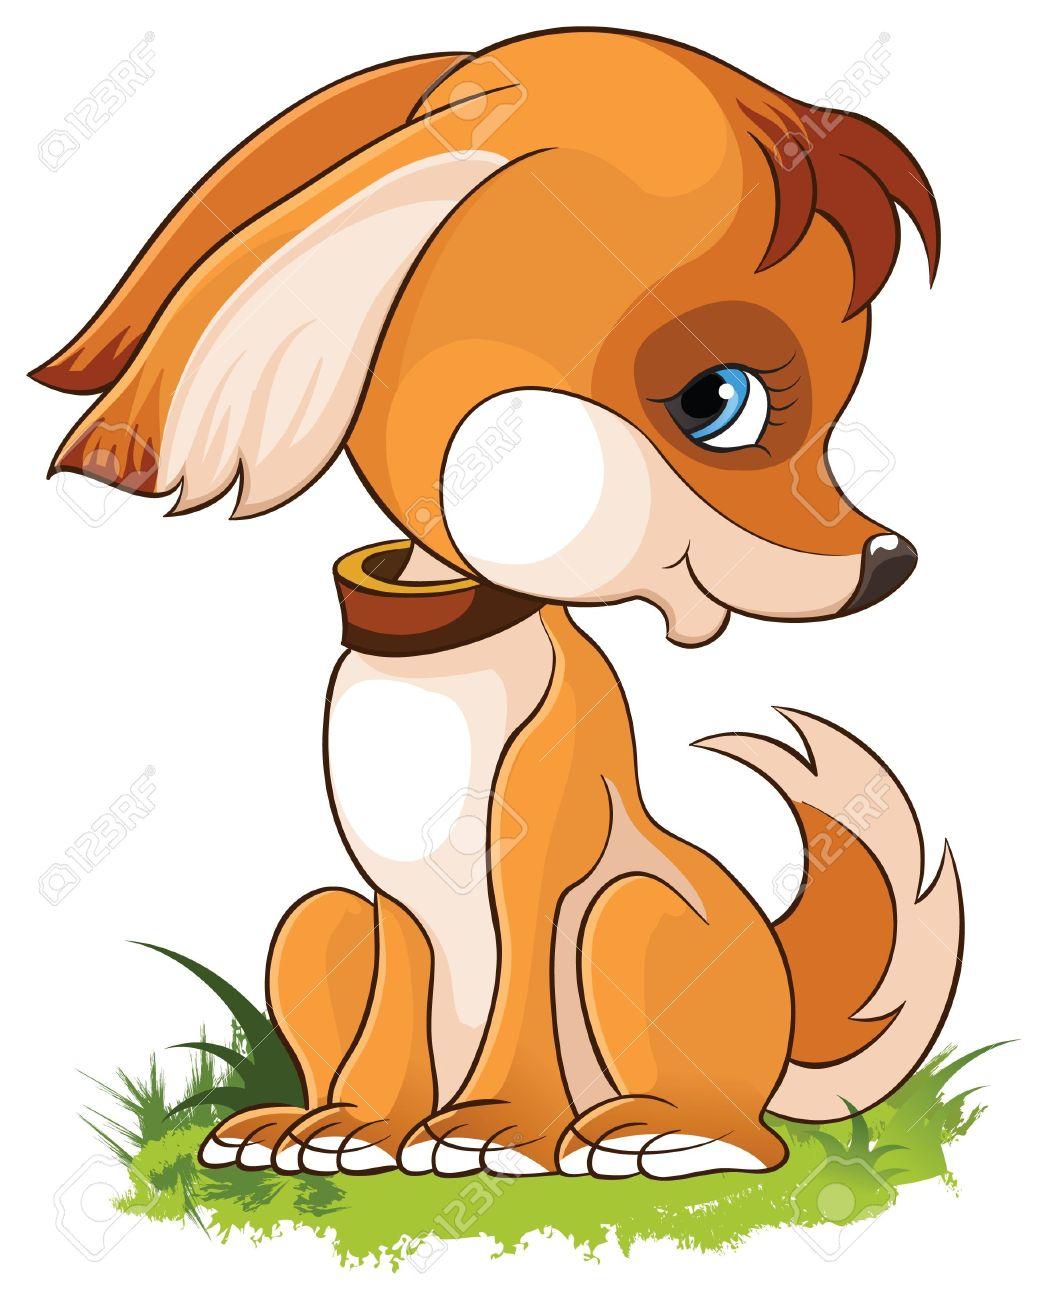 illustration of cute cartoon puppy dog isolated on white background - 13697527